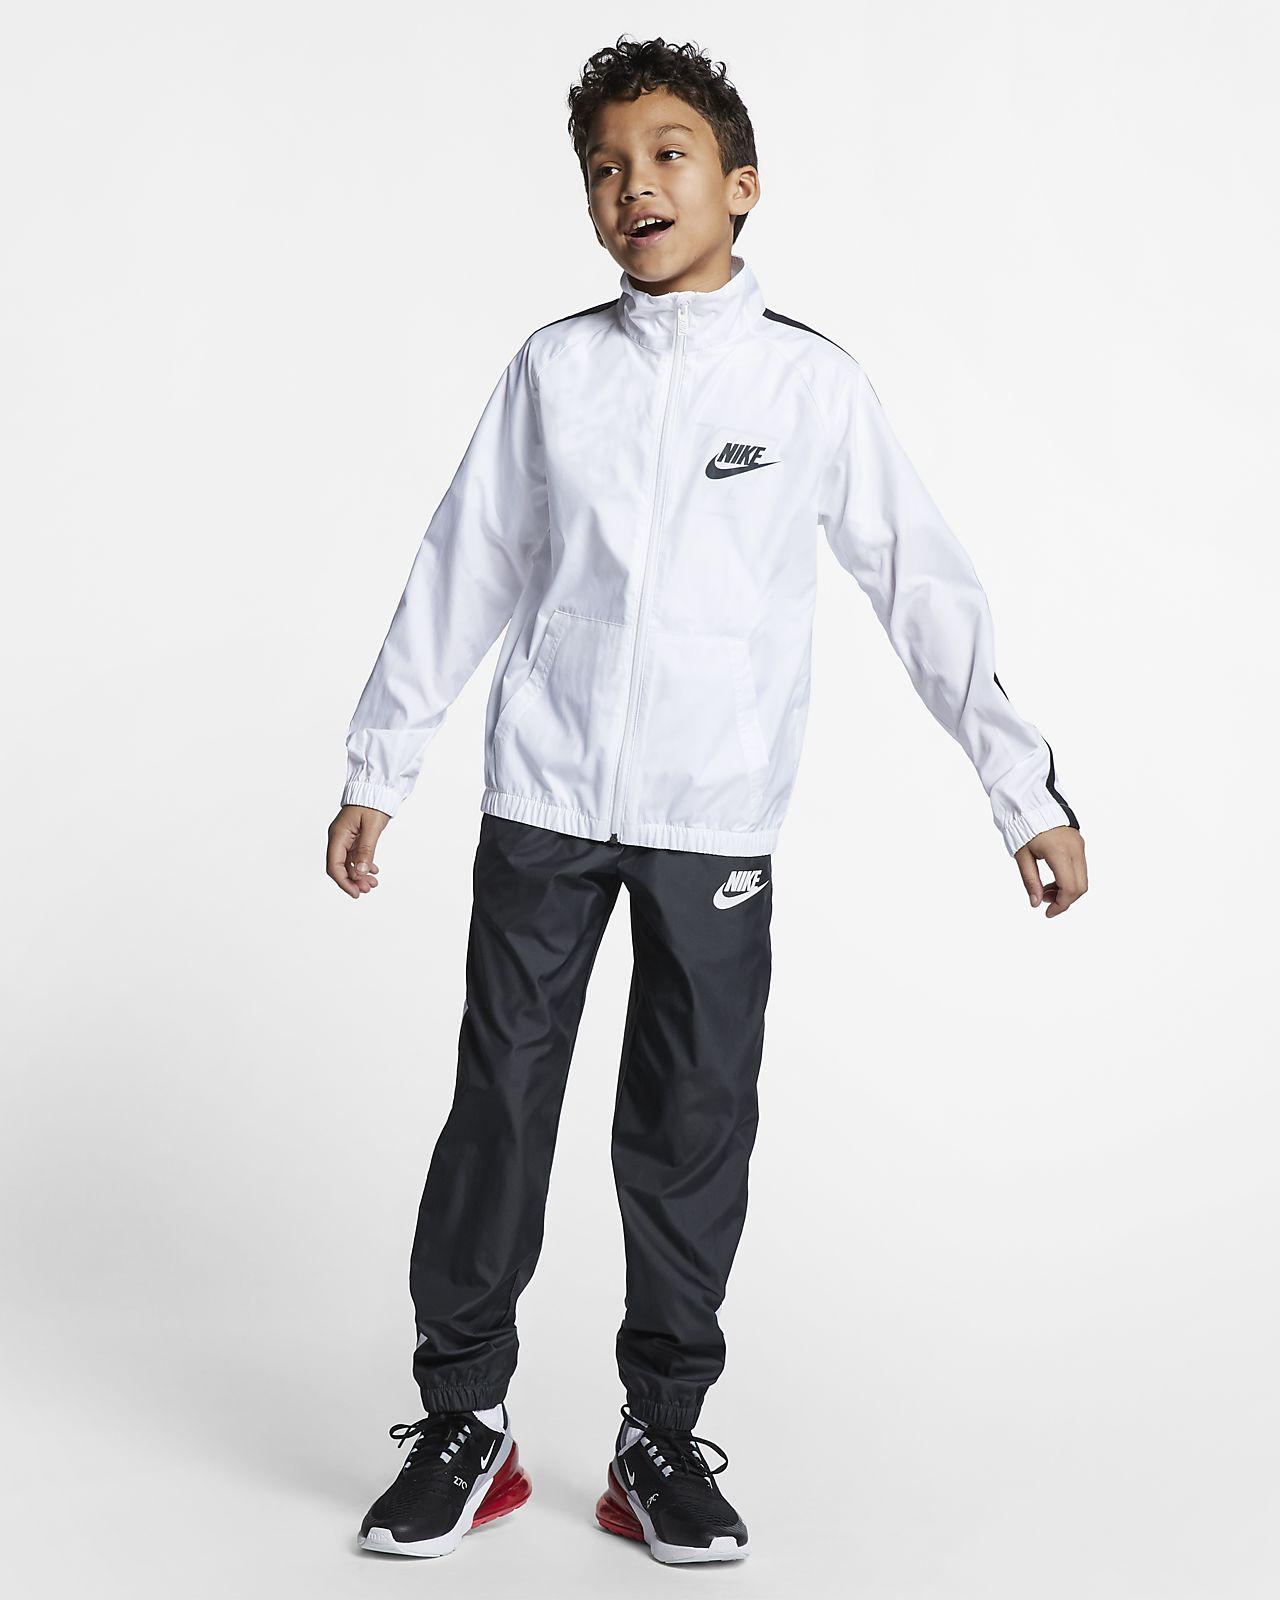 Herren Nike Sportswear Trainingsanzug Bekleidung